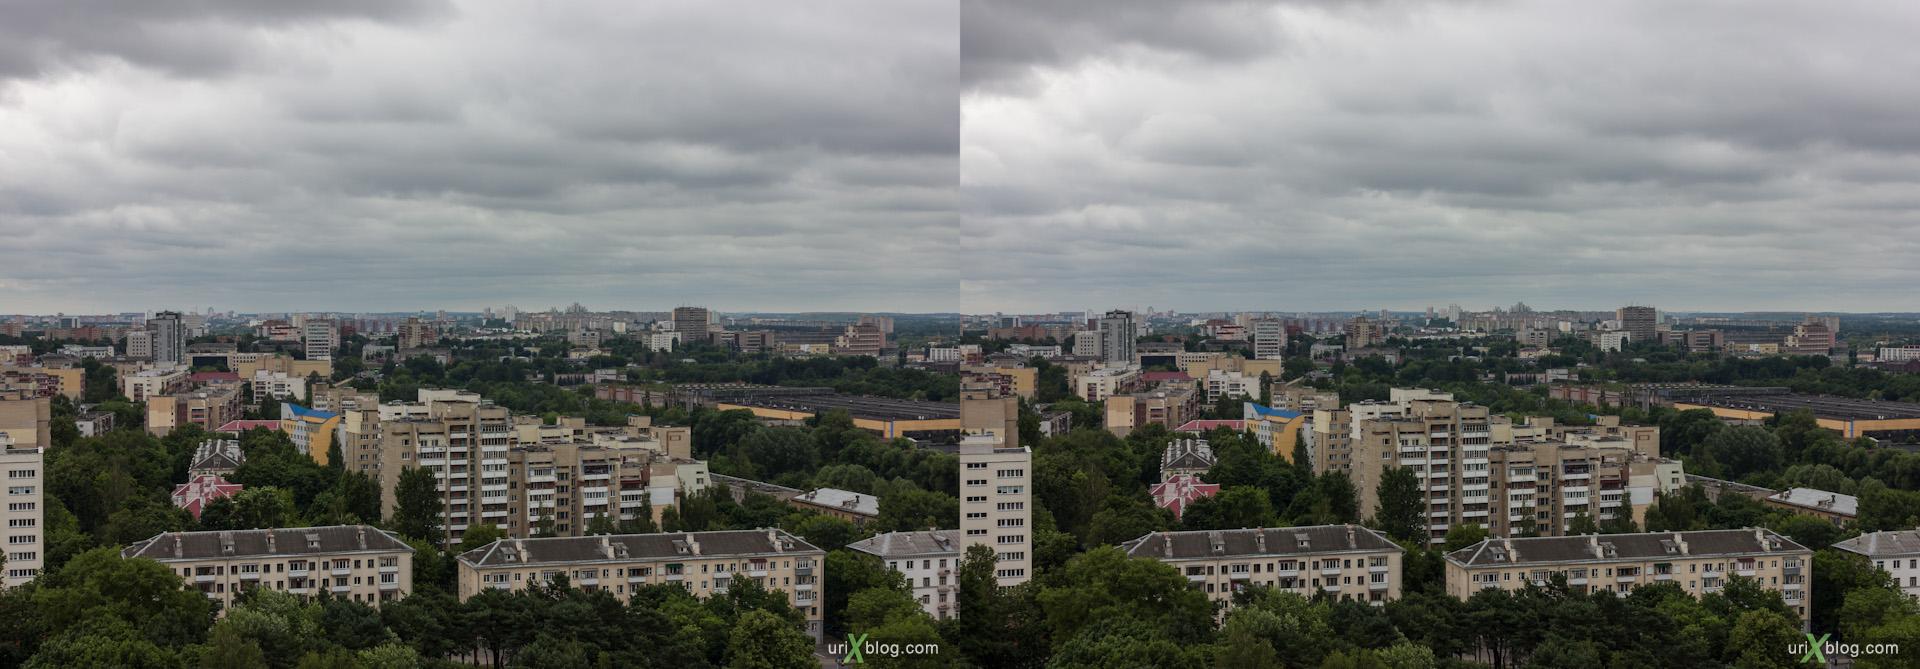 2012 Minsk Минск Белоруссия Беларусь Belarus Belorussia стерео 3д stereo 3d